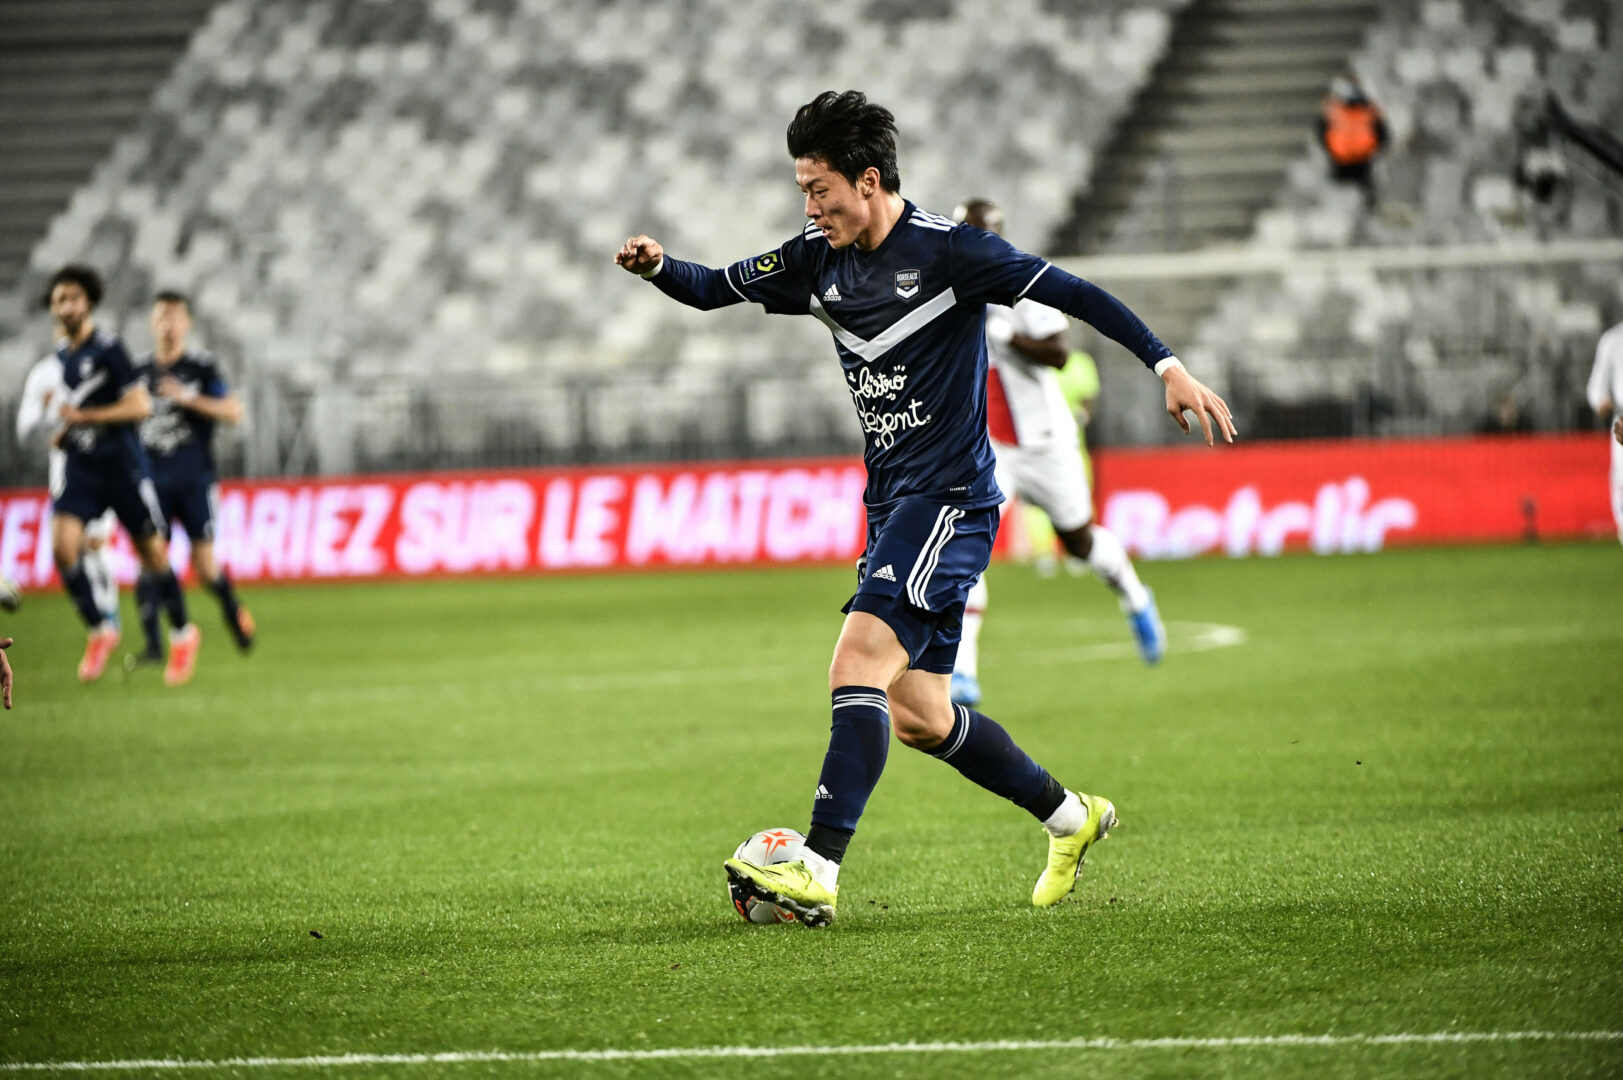 Ui-jo Hwang führt den Ball im Heimspiel von Girondins Bordeaux gegen Paris St. Germain.